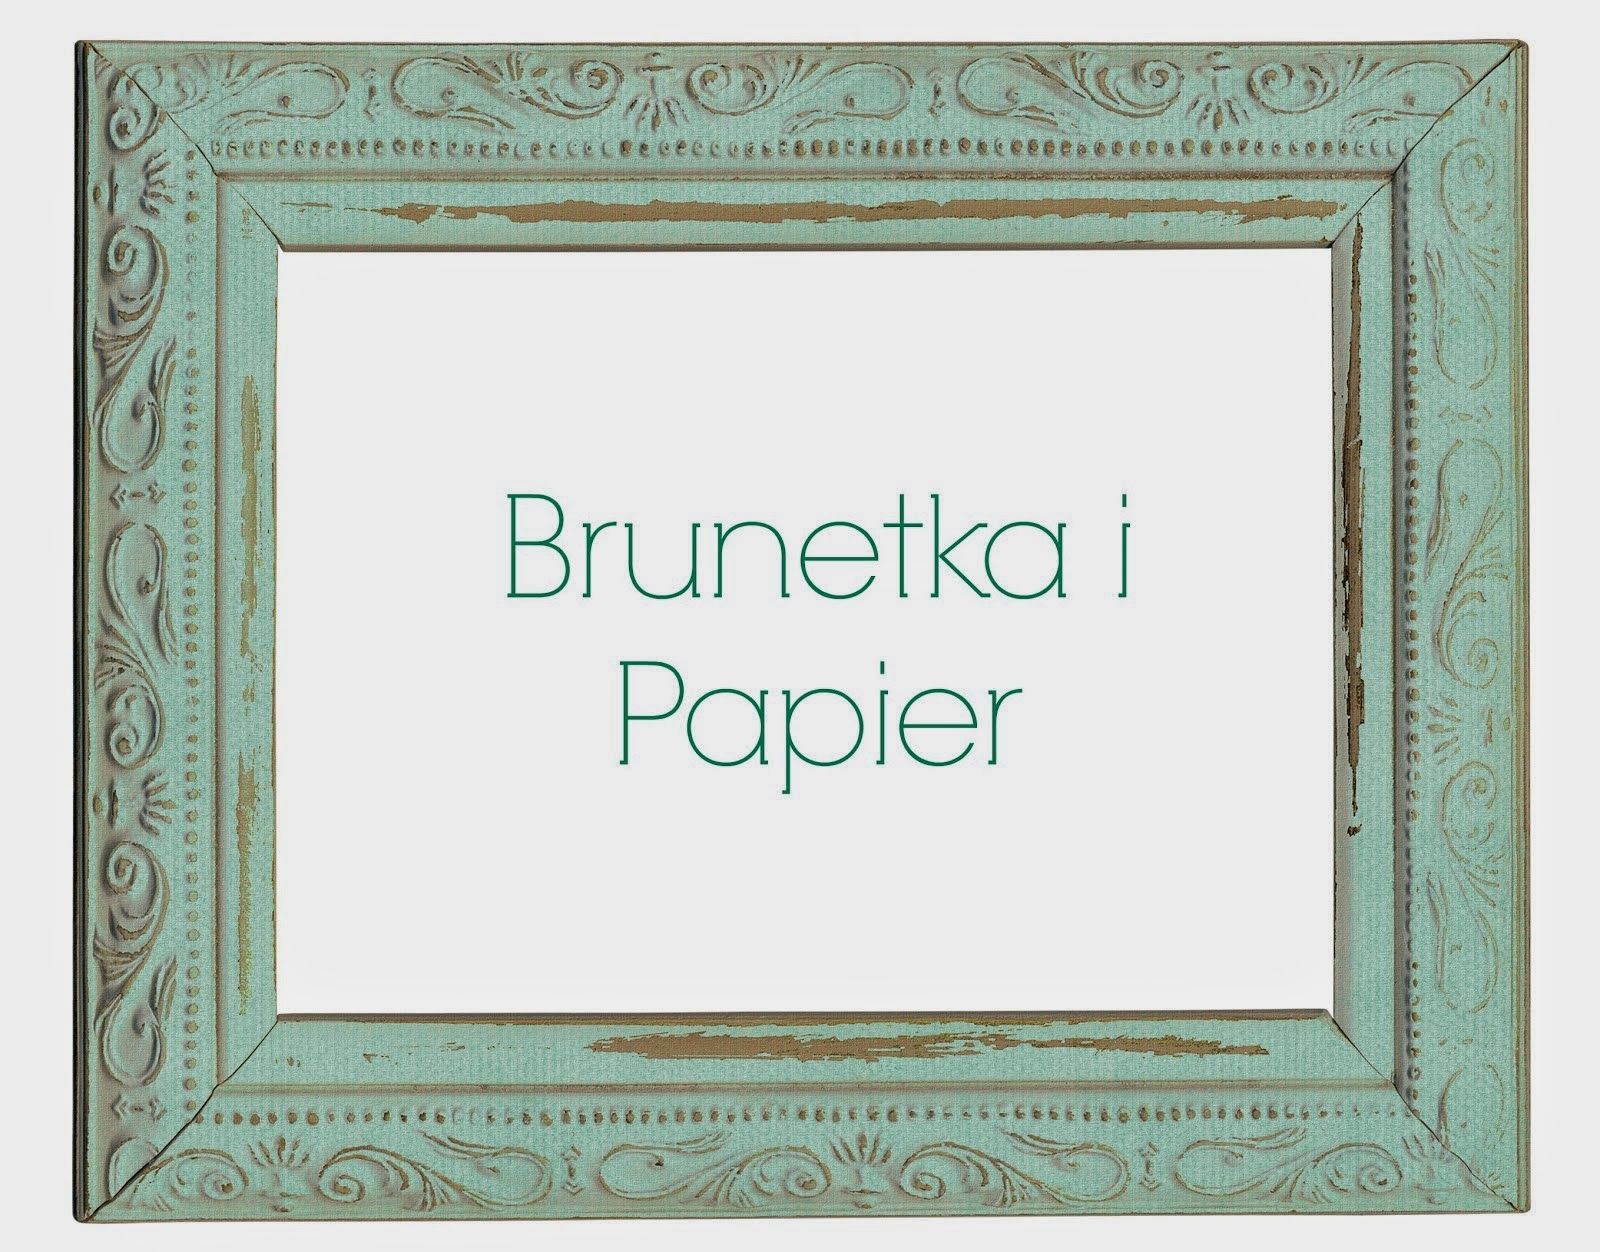 ------- Brunetka i papier -------